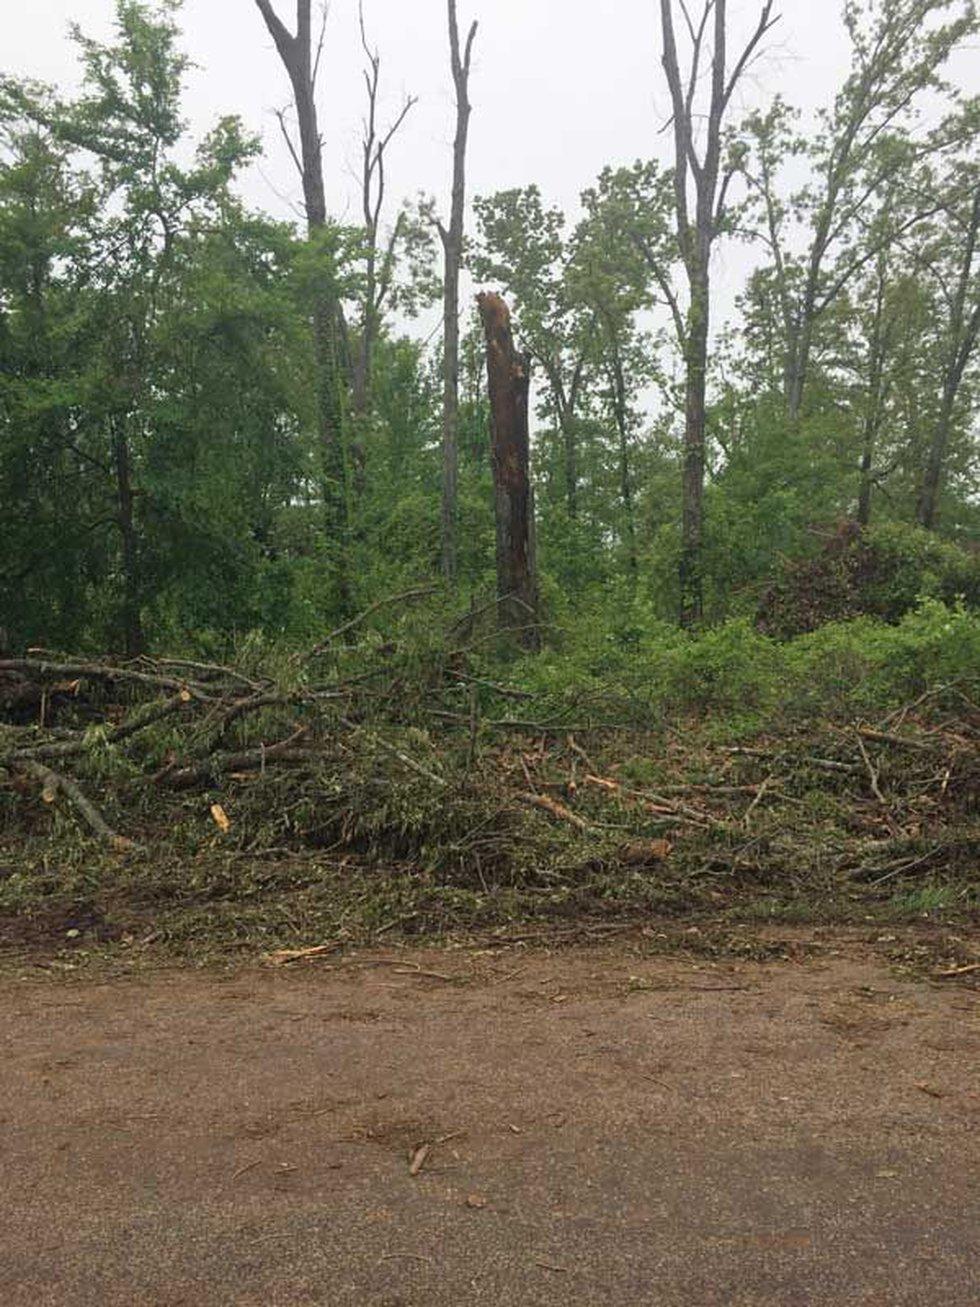 NWS crews confirm a tornado moved through the Hallsville area Thursday night. (Source: KLTV...